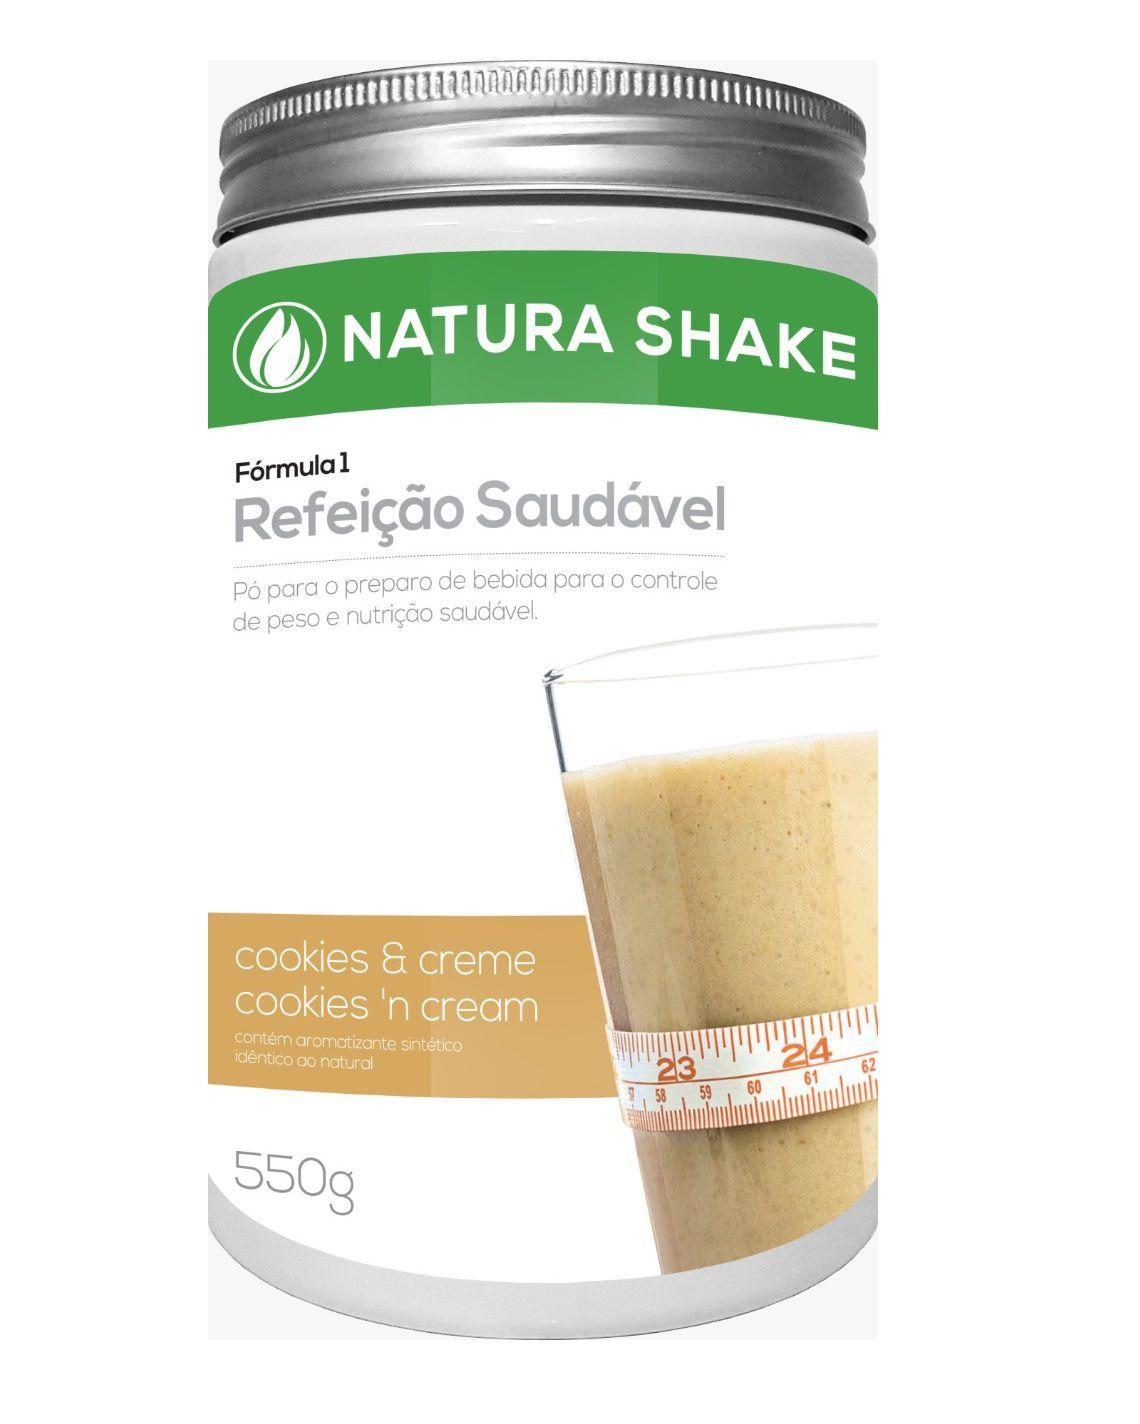 Natura Shake Sabor Cookies e Cream 550g - Ideal Para Dieta